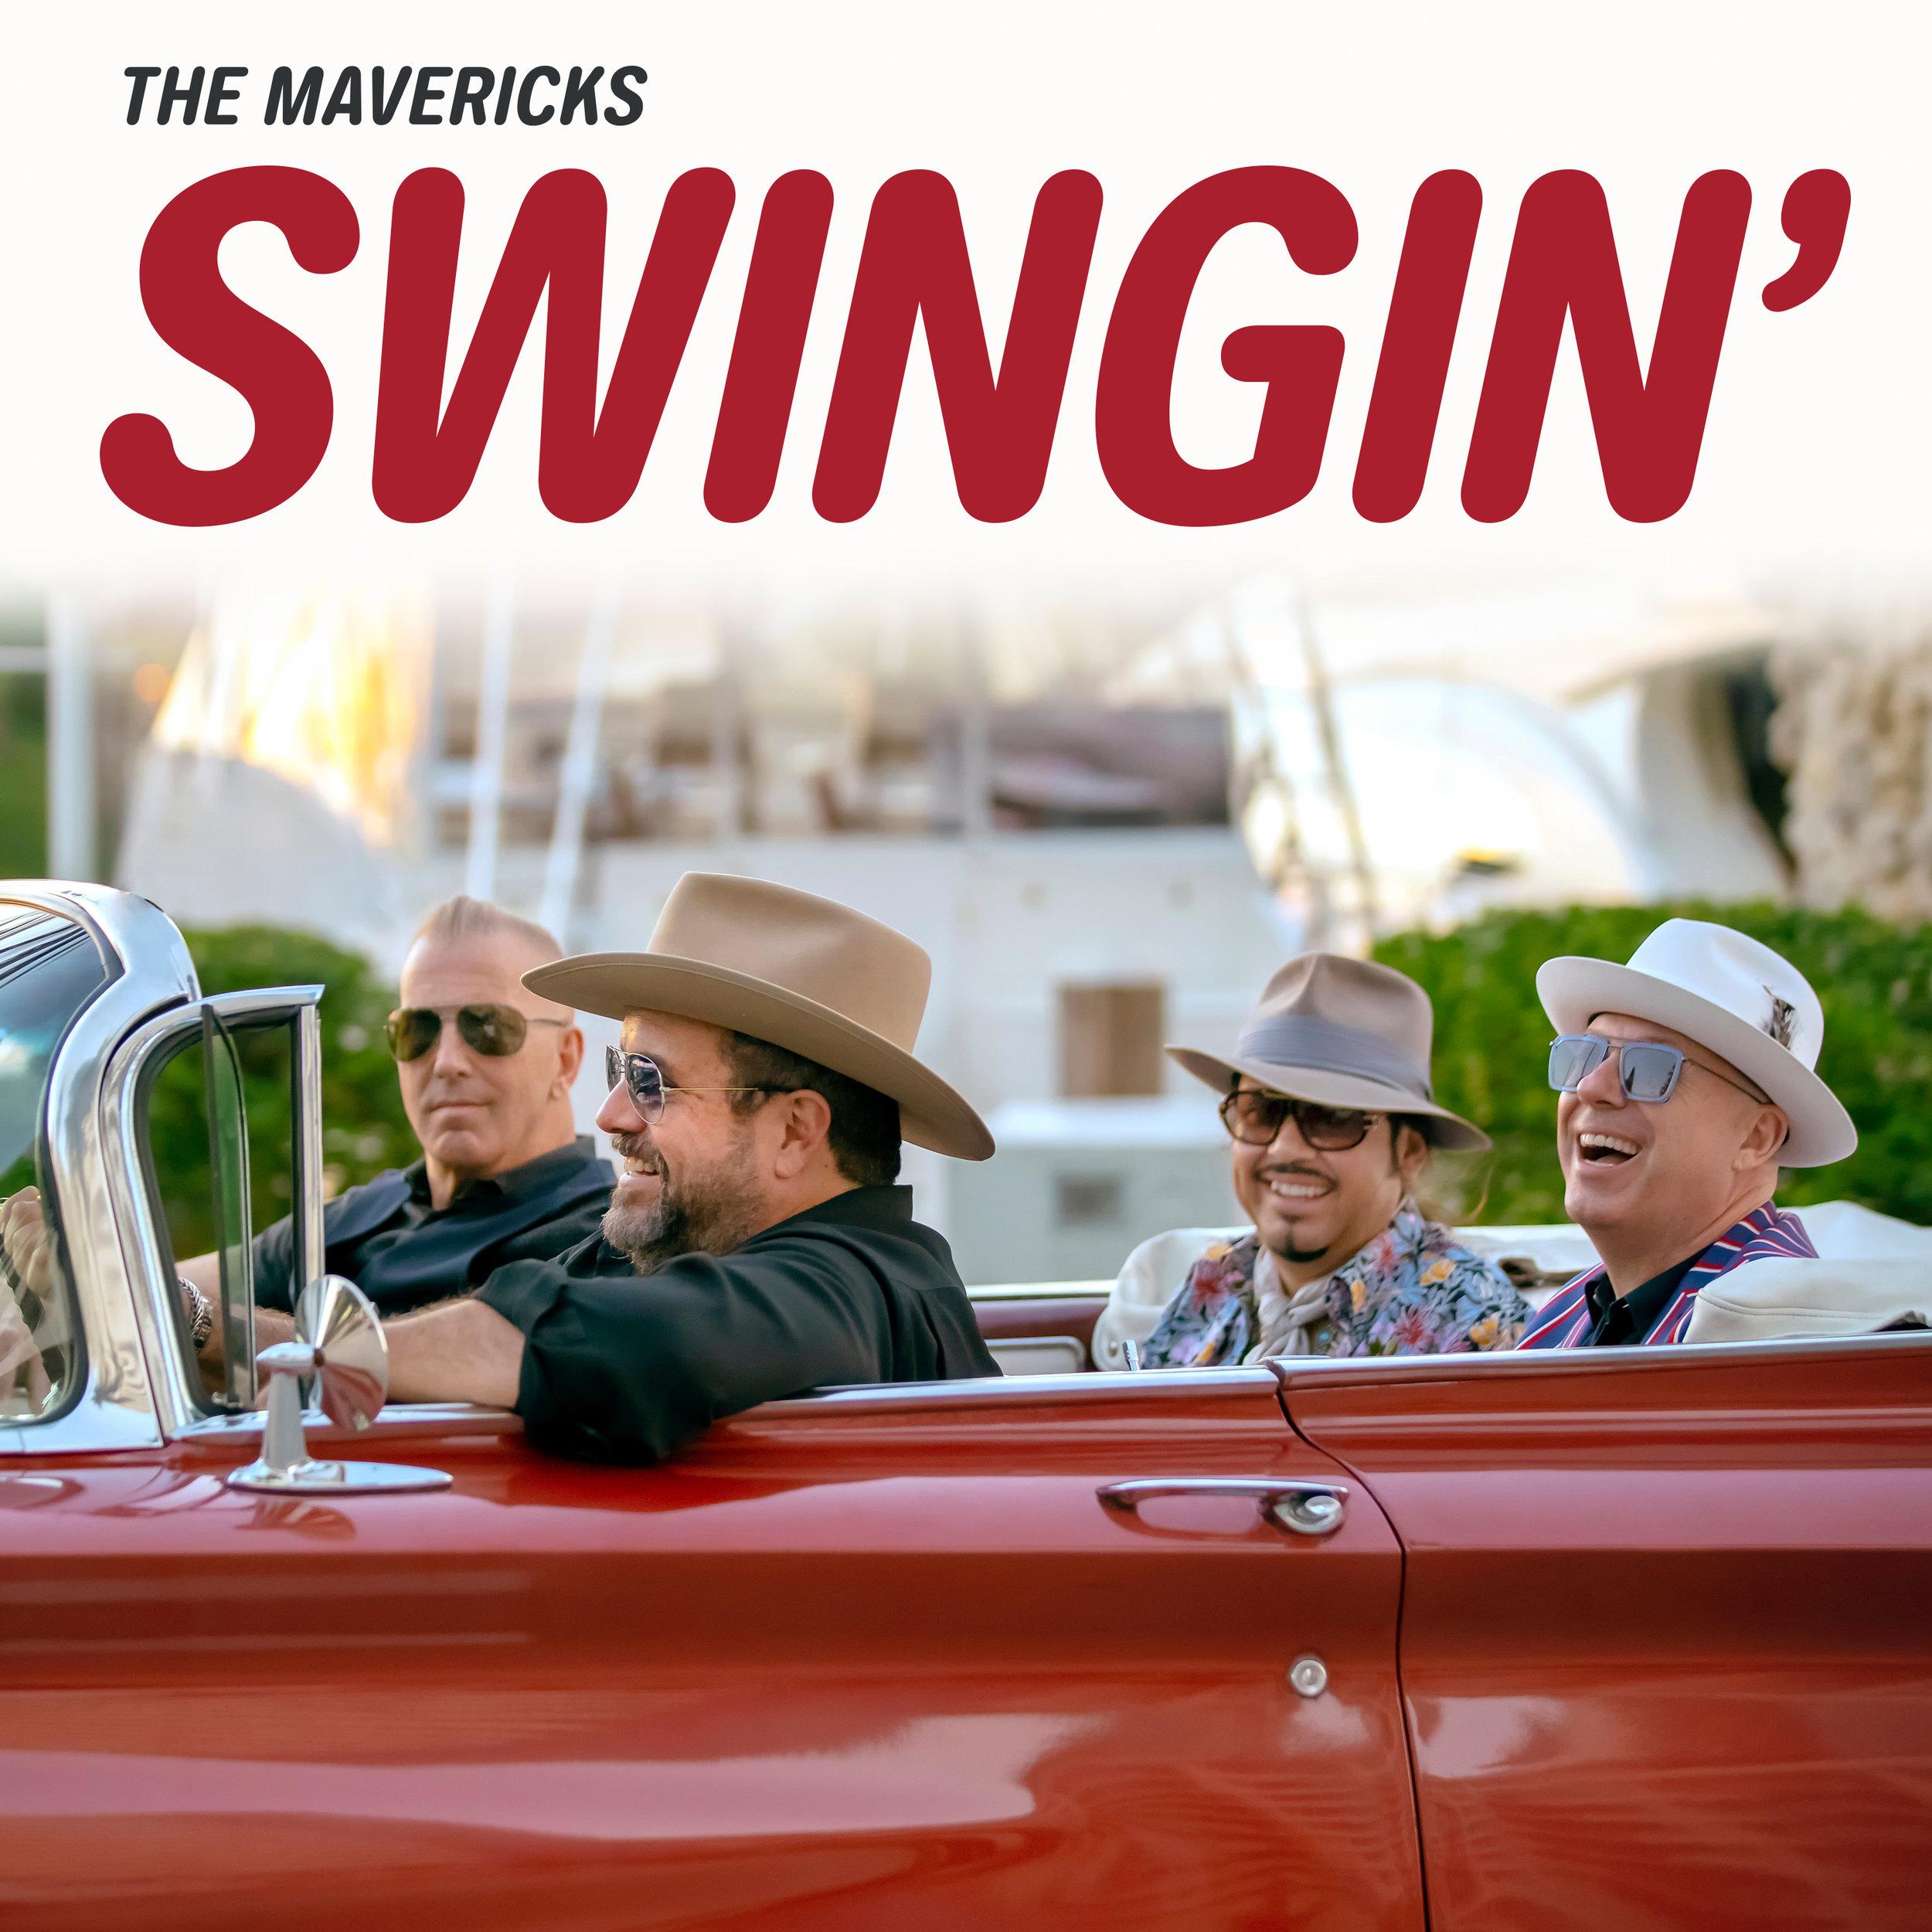 Mavericks_Swingin_Final.jpg